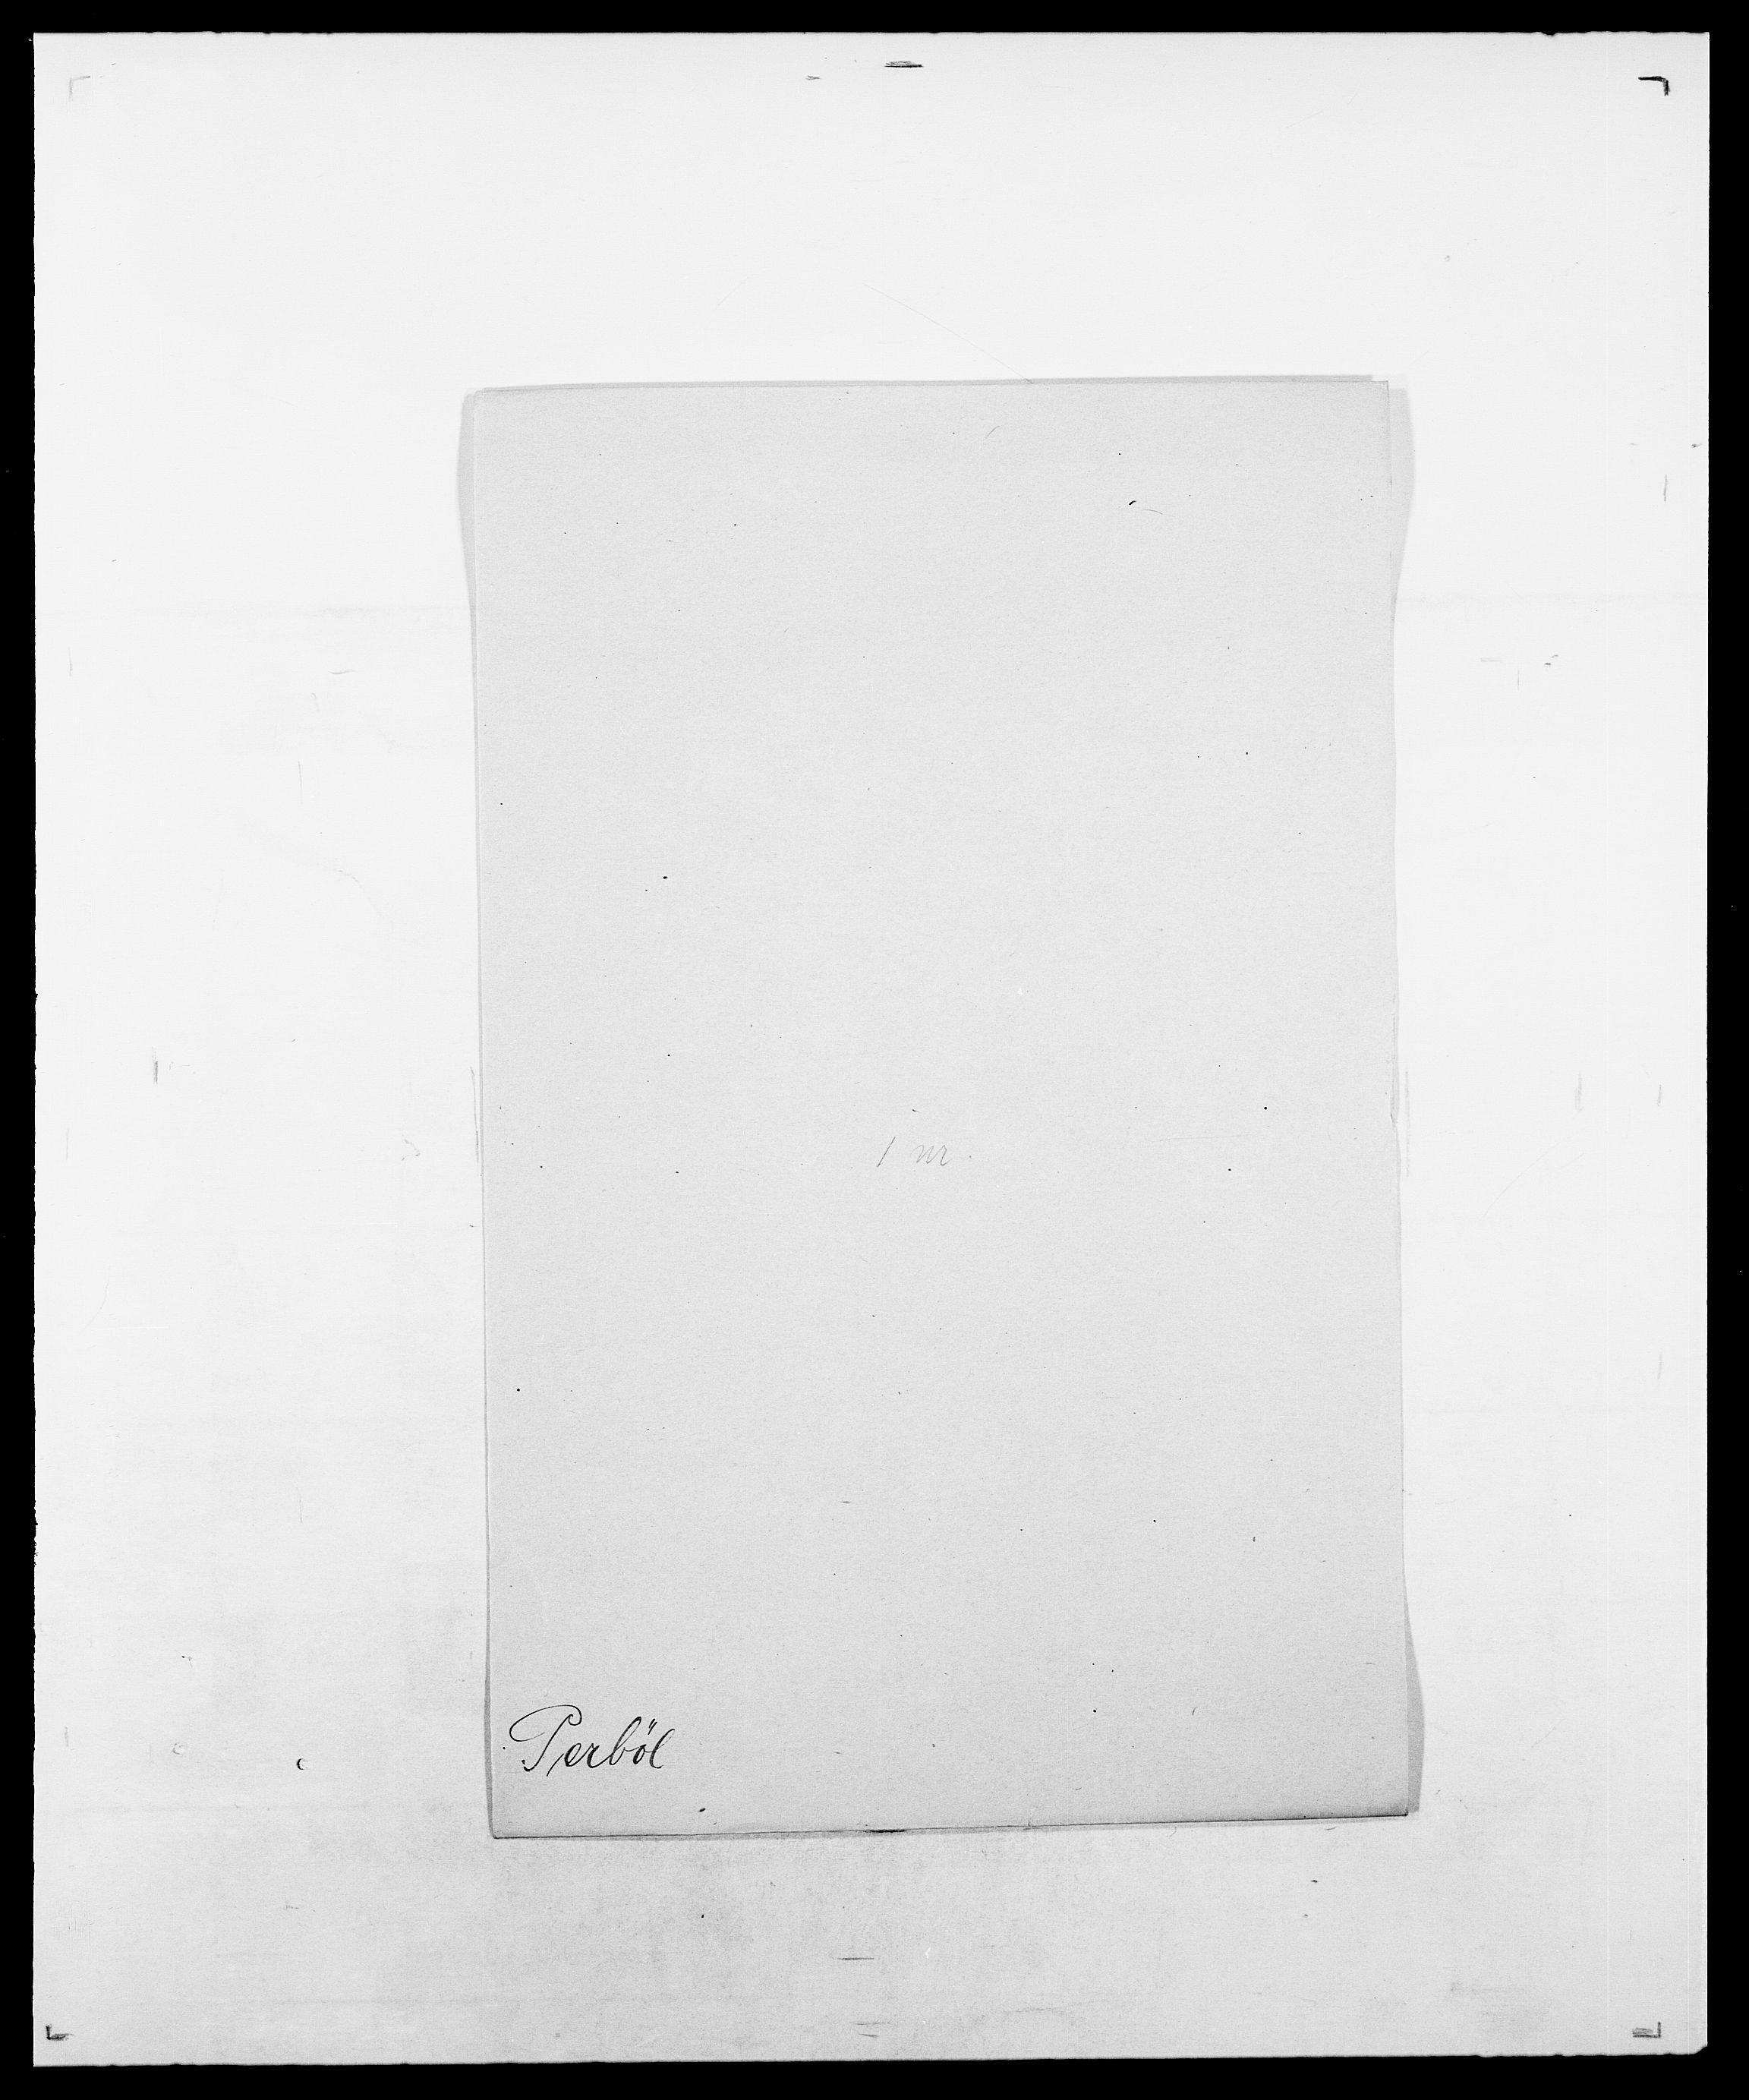 SAO, Delgobe, Charles Antoine - samling, D/Da/L0030: Paars - Pittelkov, s. 361